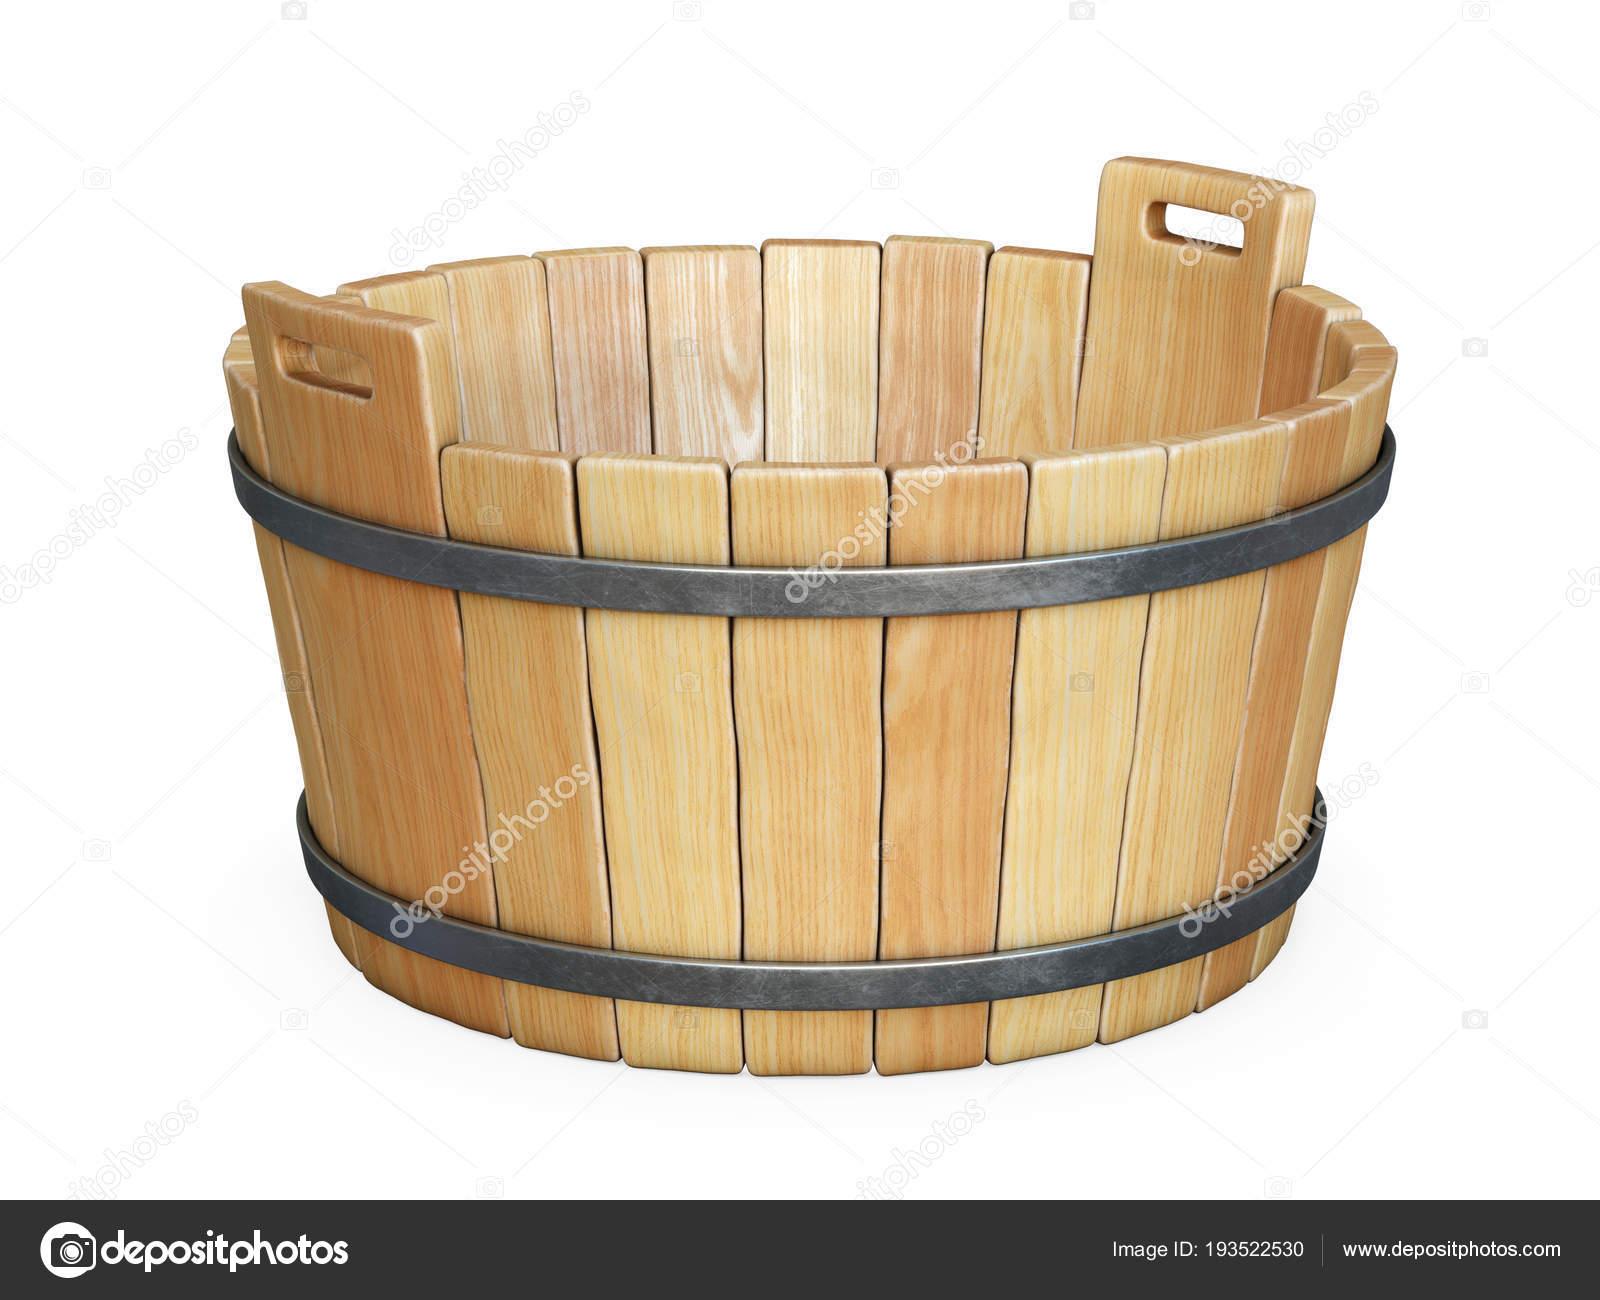 Vasca Da Bagno Bassa : Vasca bagno legno isolato priorità bassa bianca rendering u2014 foto